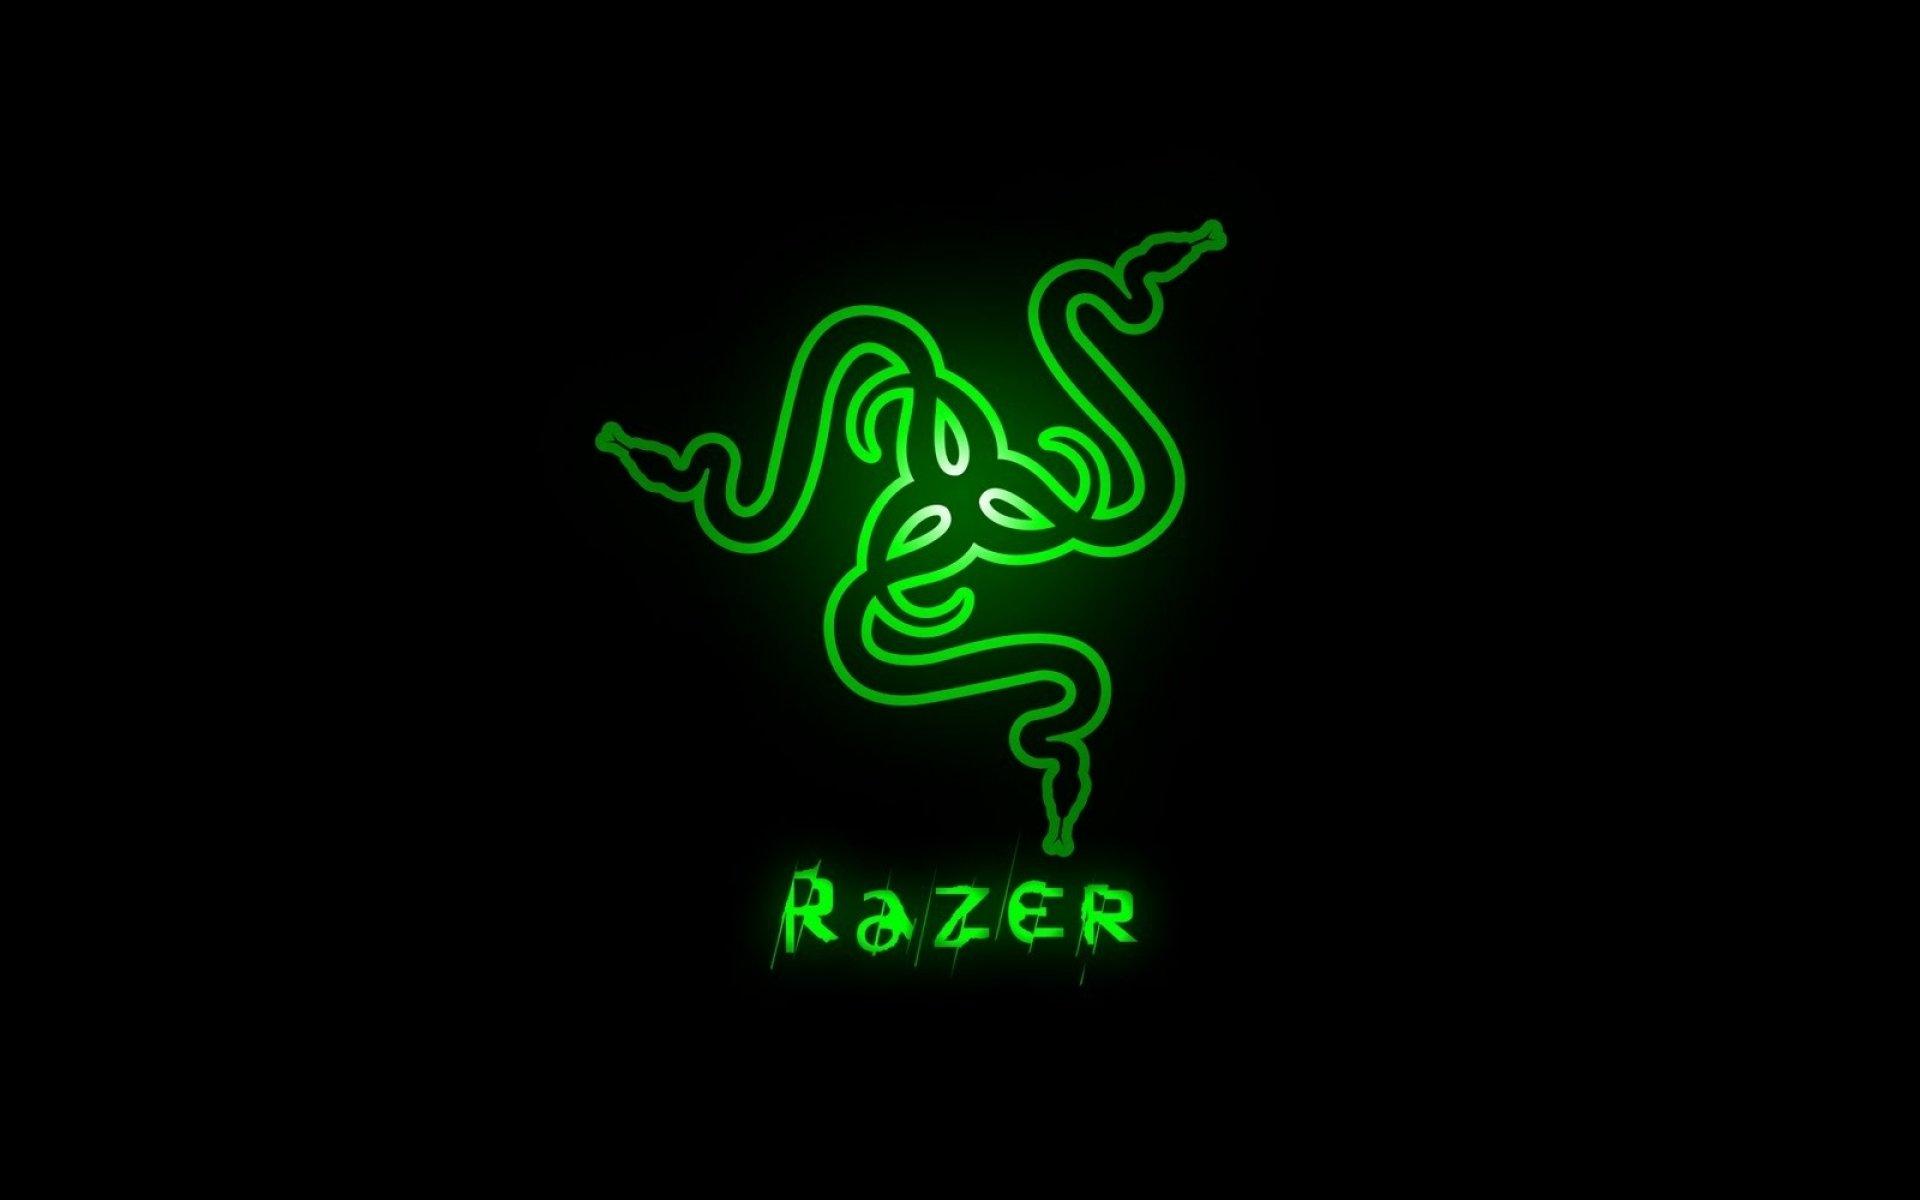 RAZER GAMING computer game wallpaper 1920x1200 400677 1920x1200